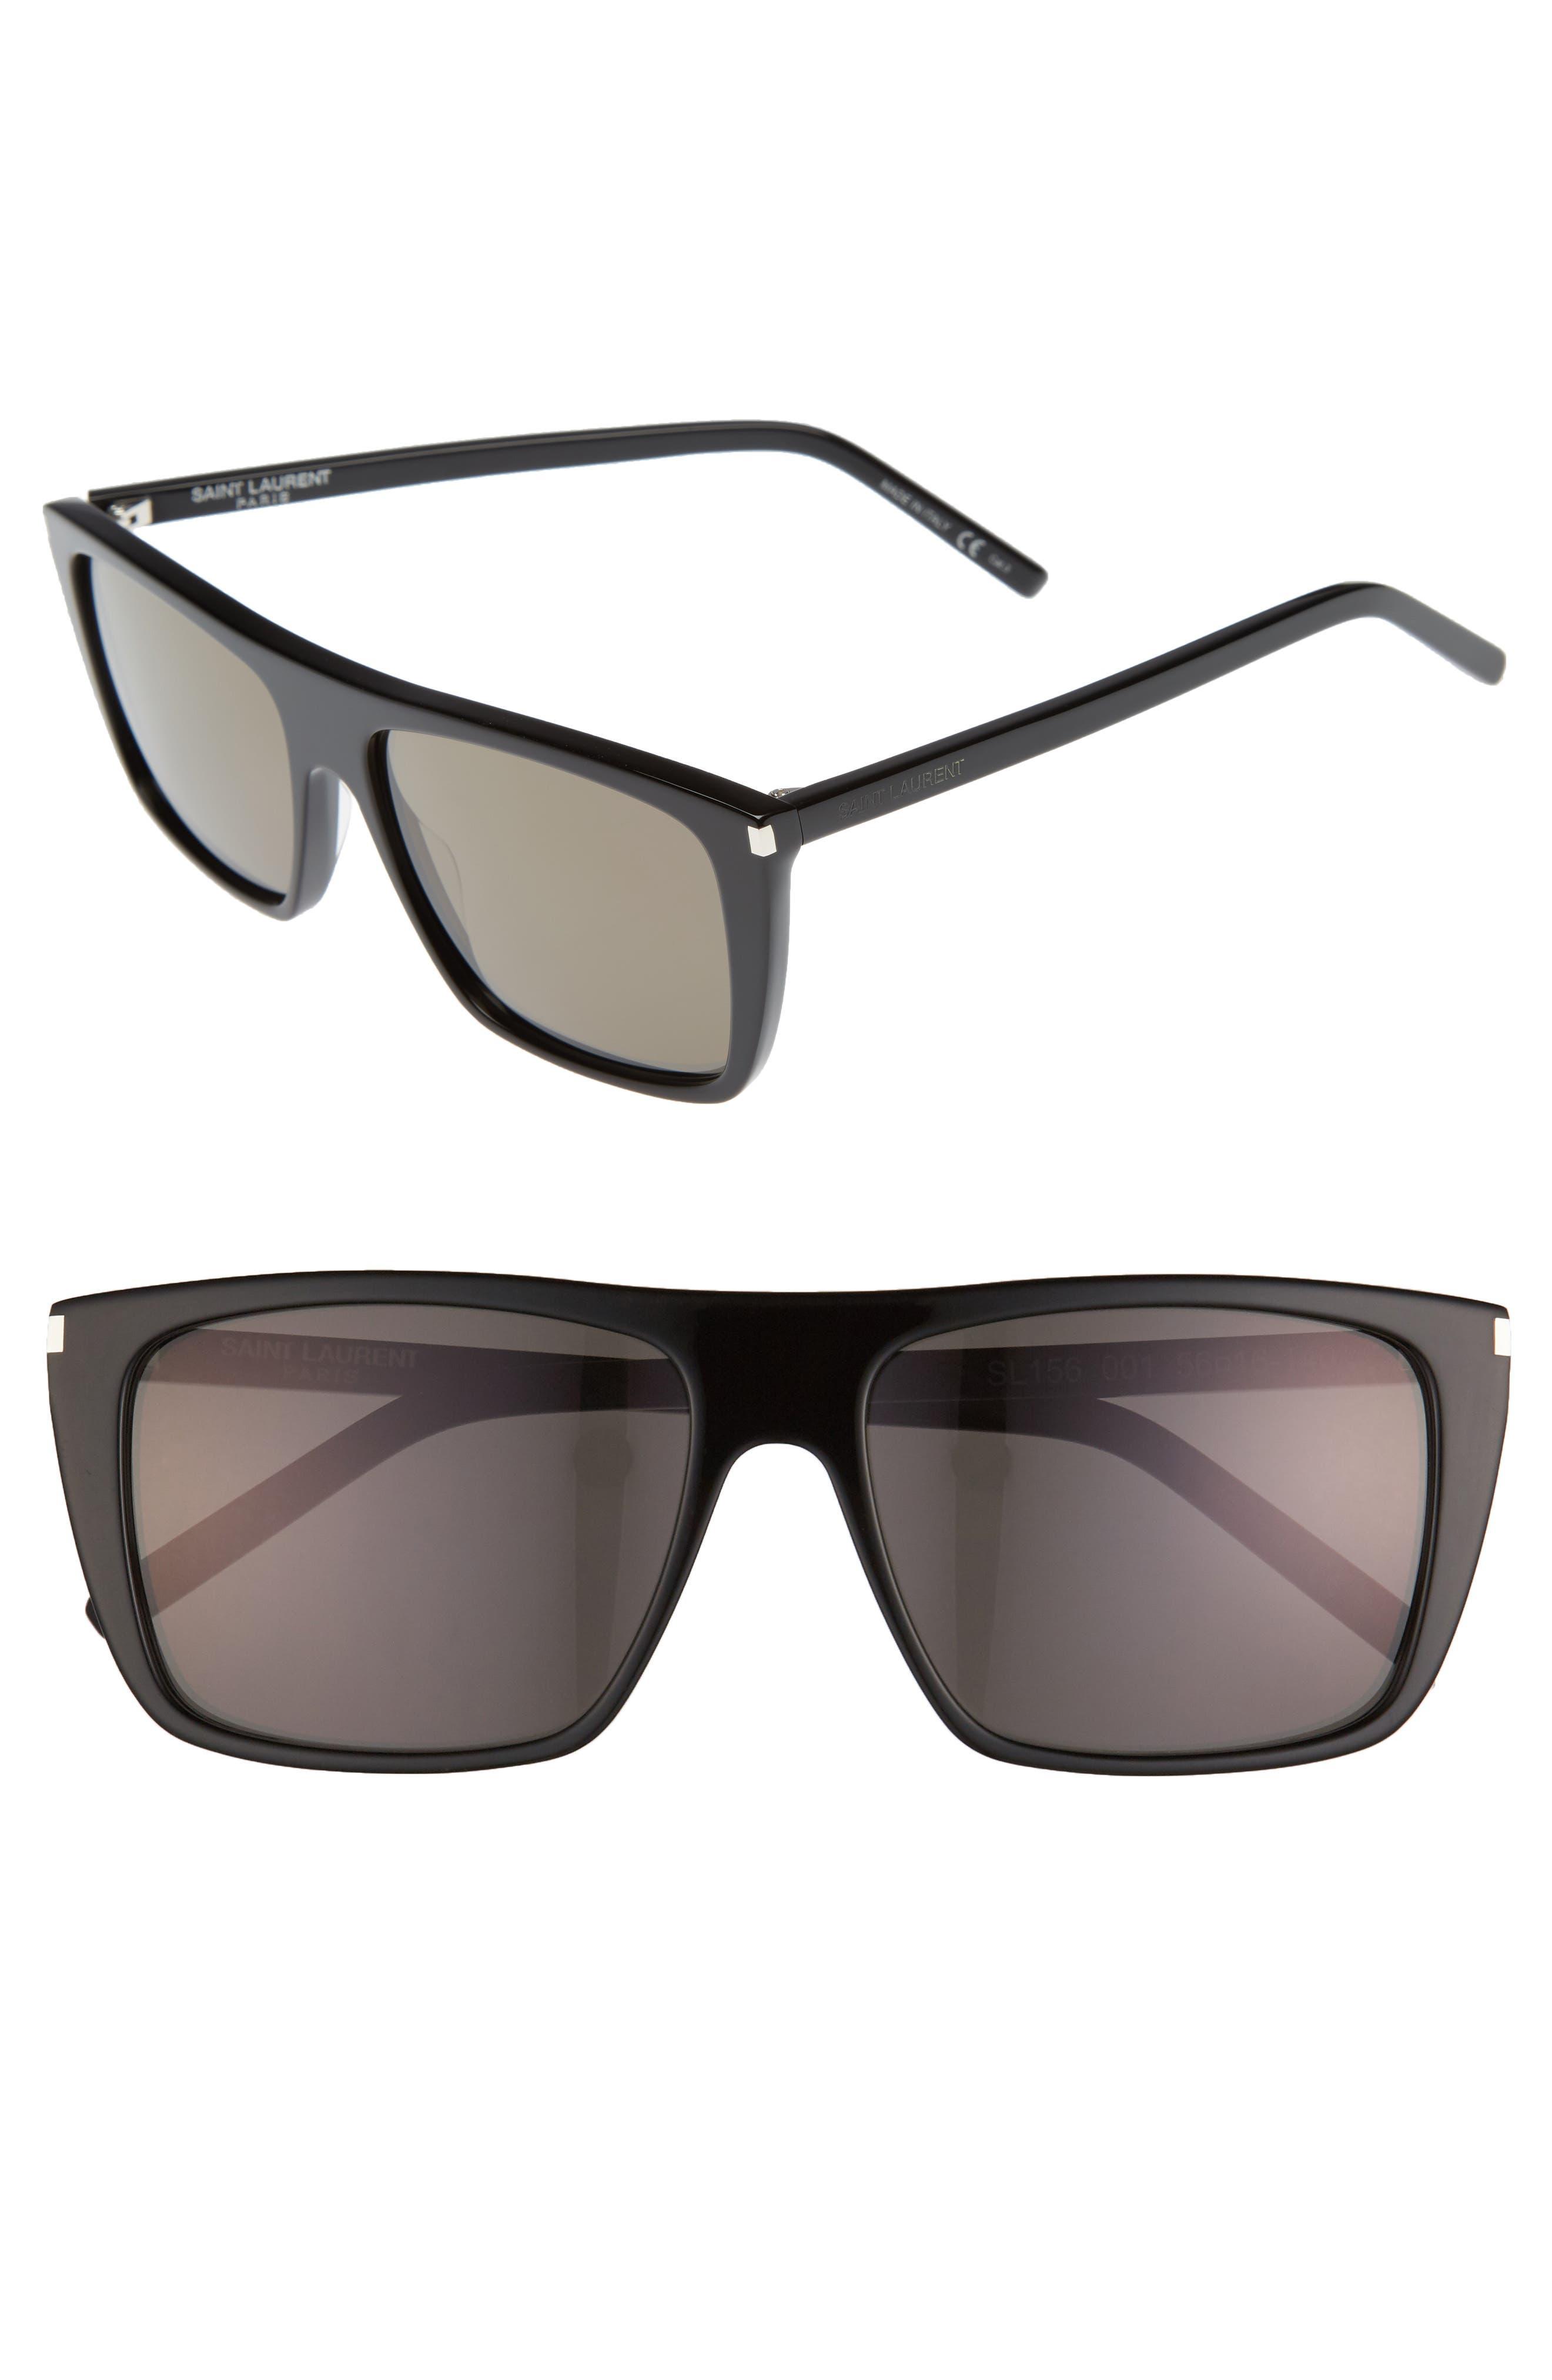 SAINT LAURENT Avana 56mm Flat Top Sunglasses, Main, color, 001